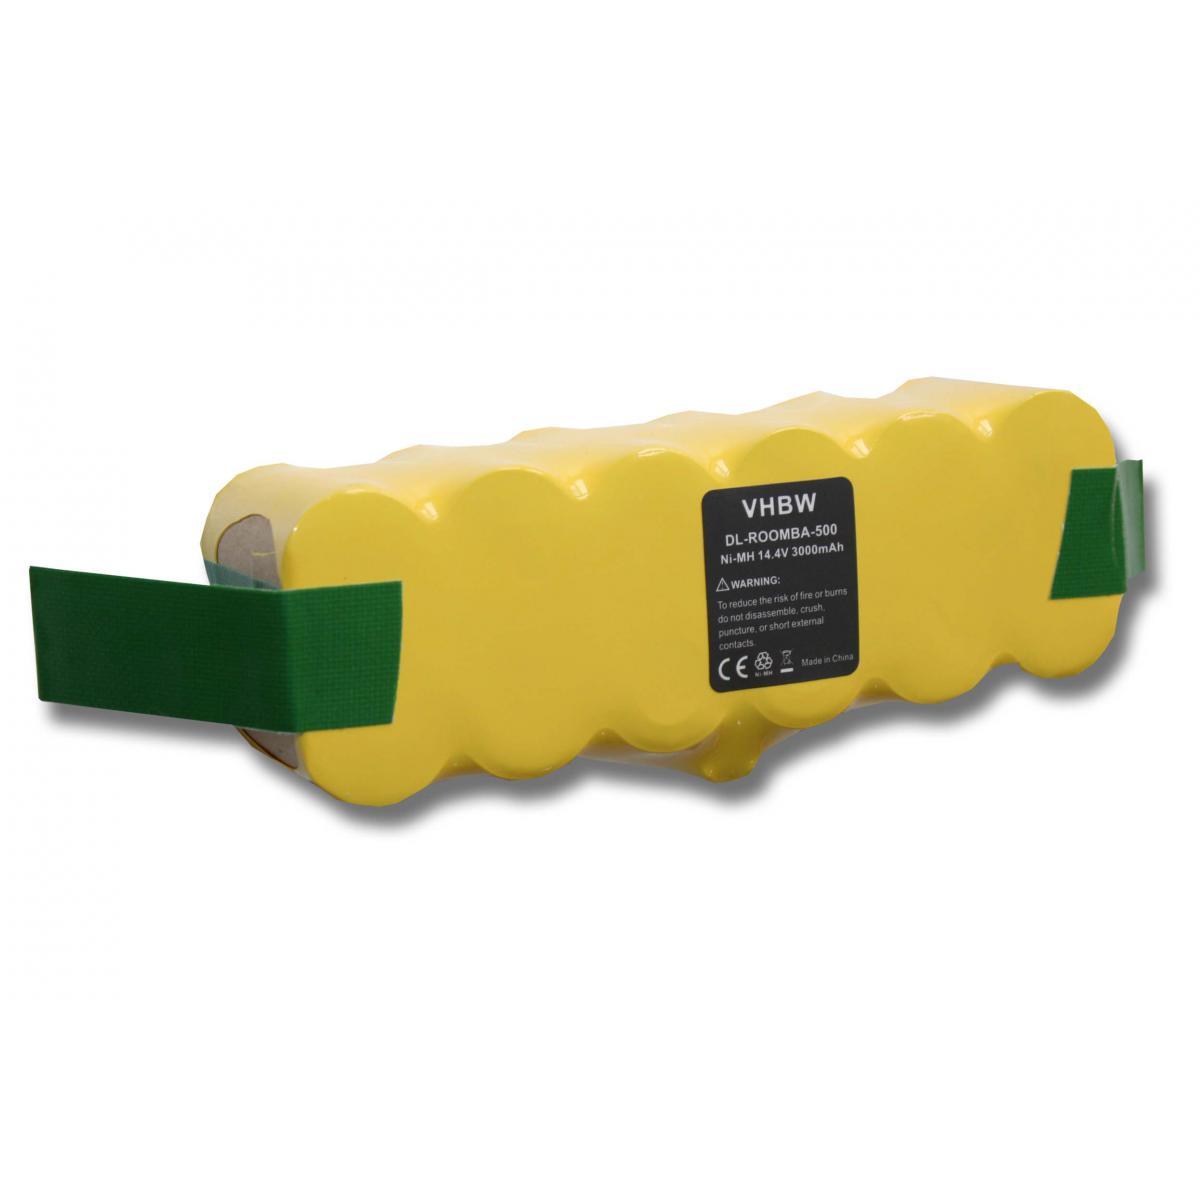 Vhbw vhbw batterie Ni-MH 3000mAh (14.4V) compatible avec iRobot Roomba 605, 615, 616, 621, 651 aspirateur remplace 11702, D-R